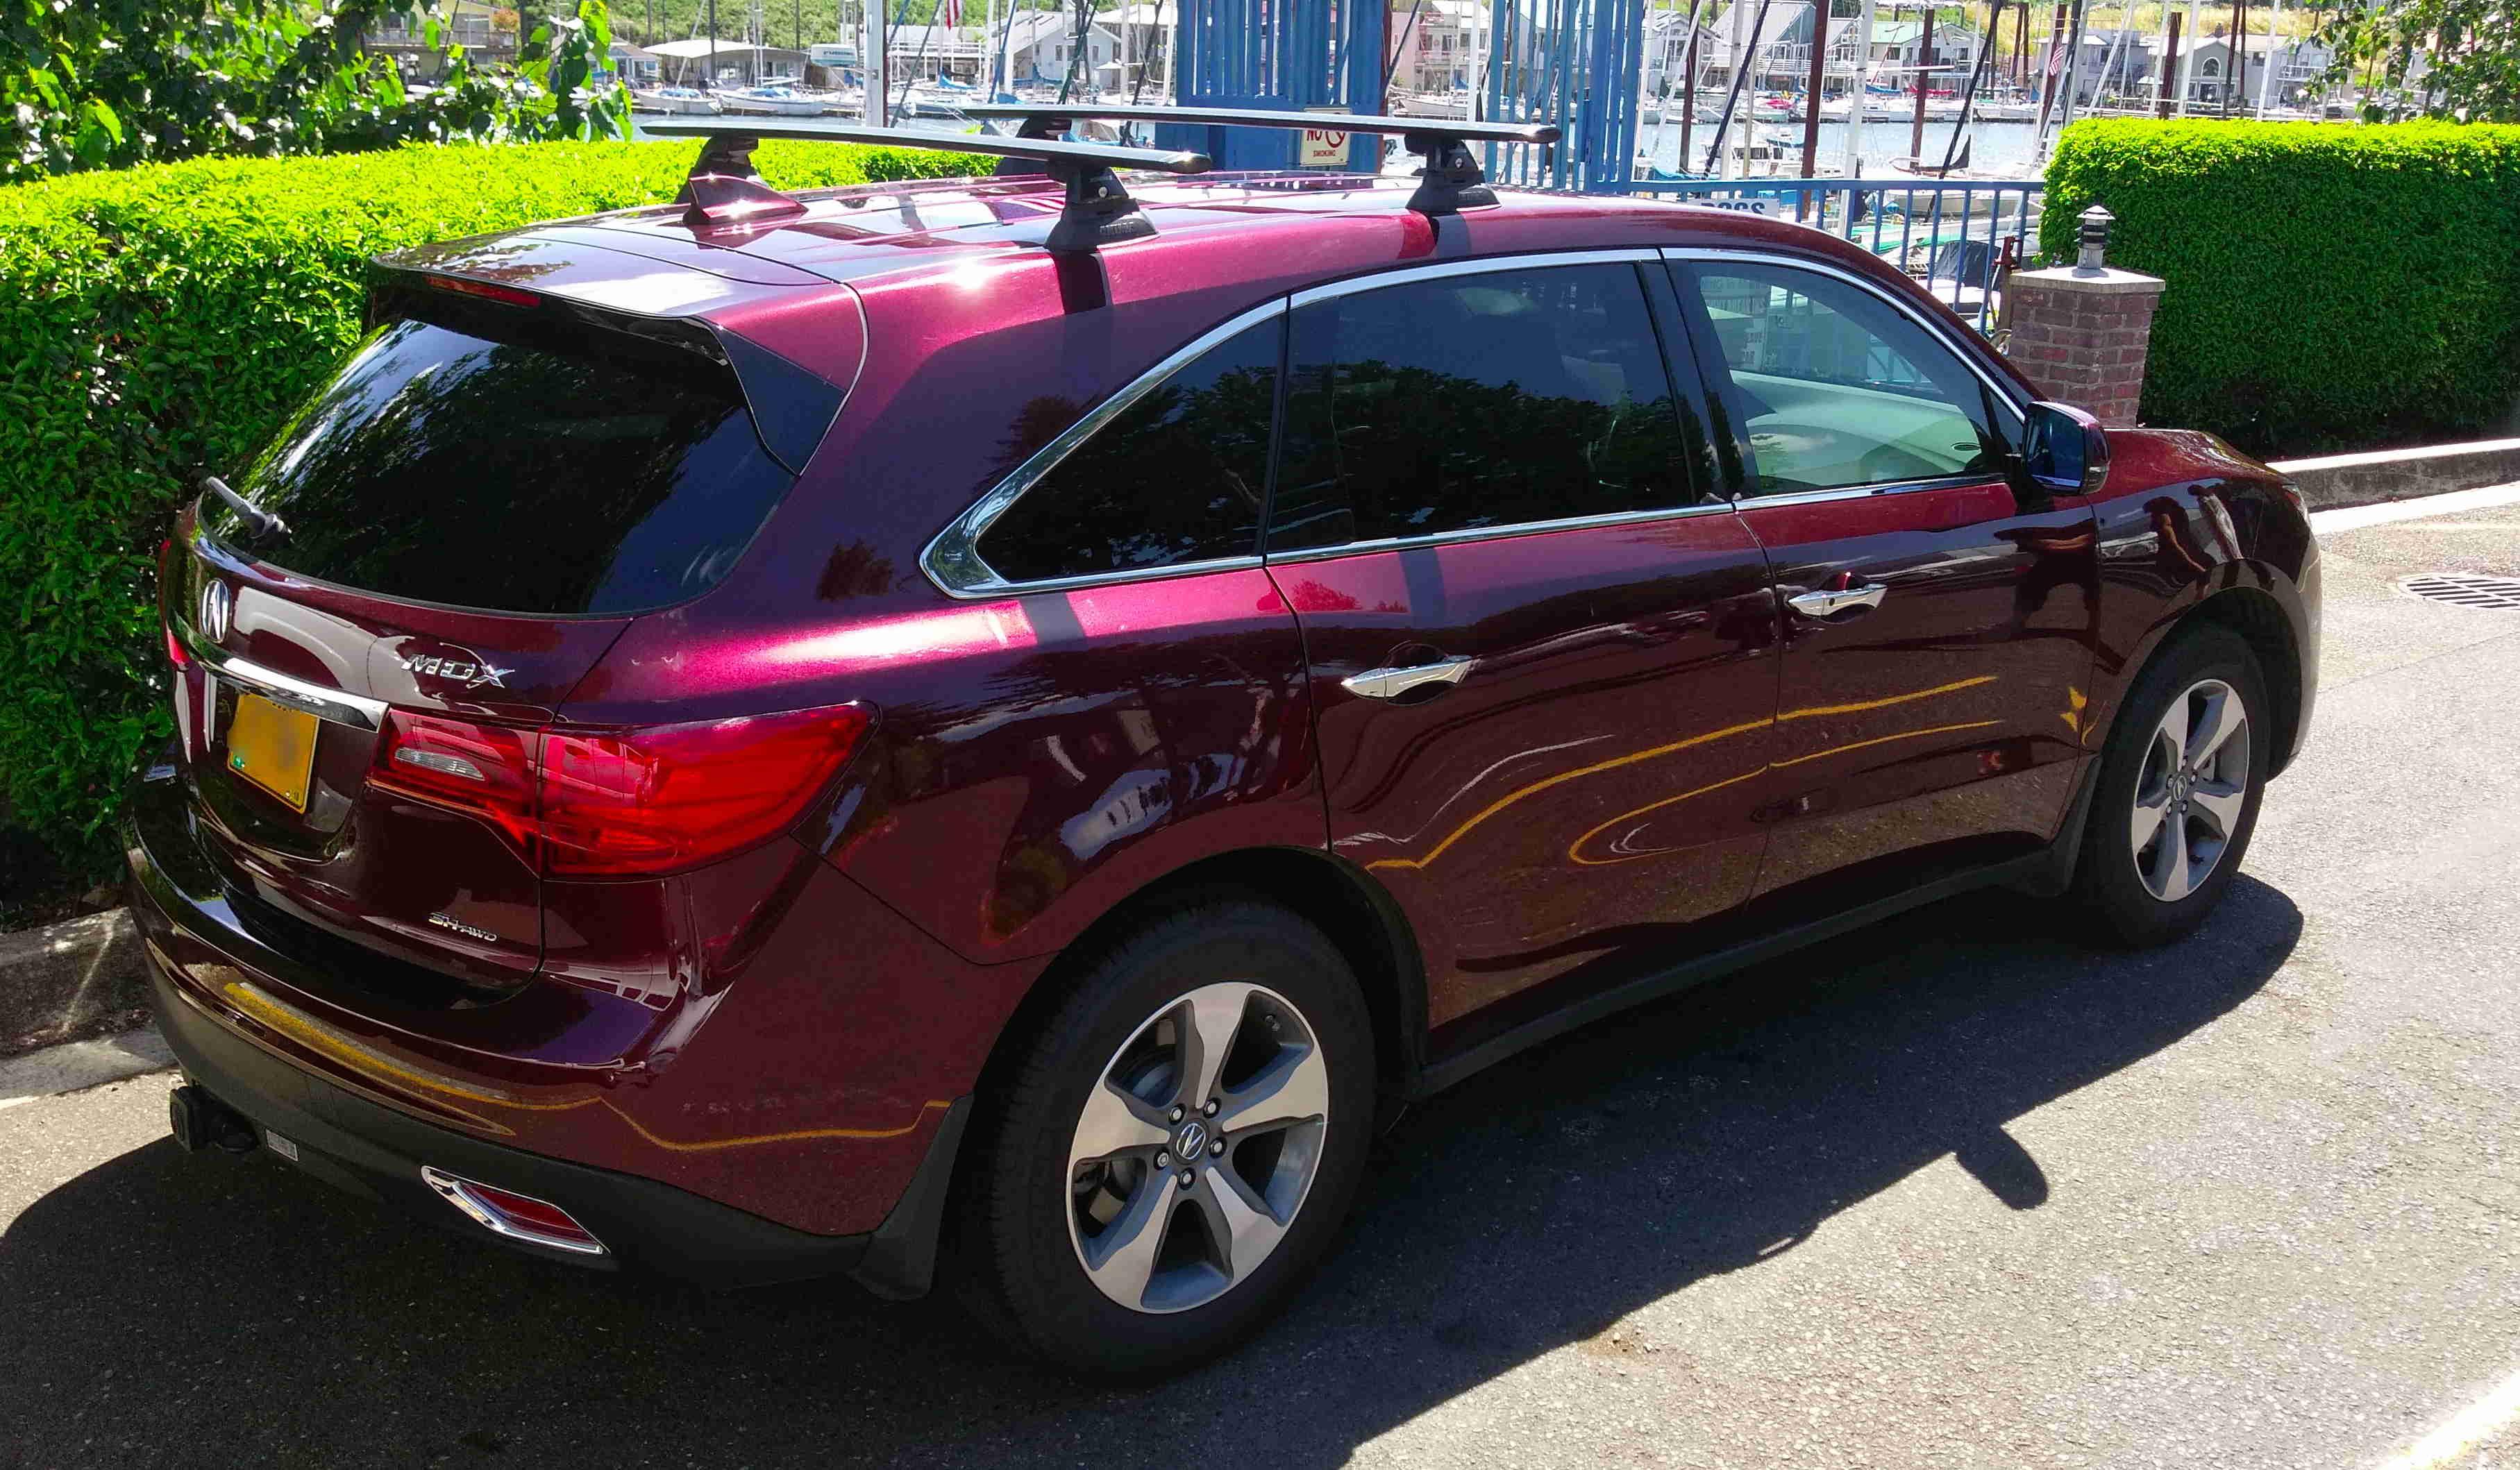 Roof Racks A Better Option Imho Acura Mdx Suv Forums